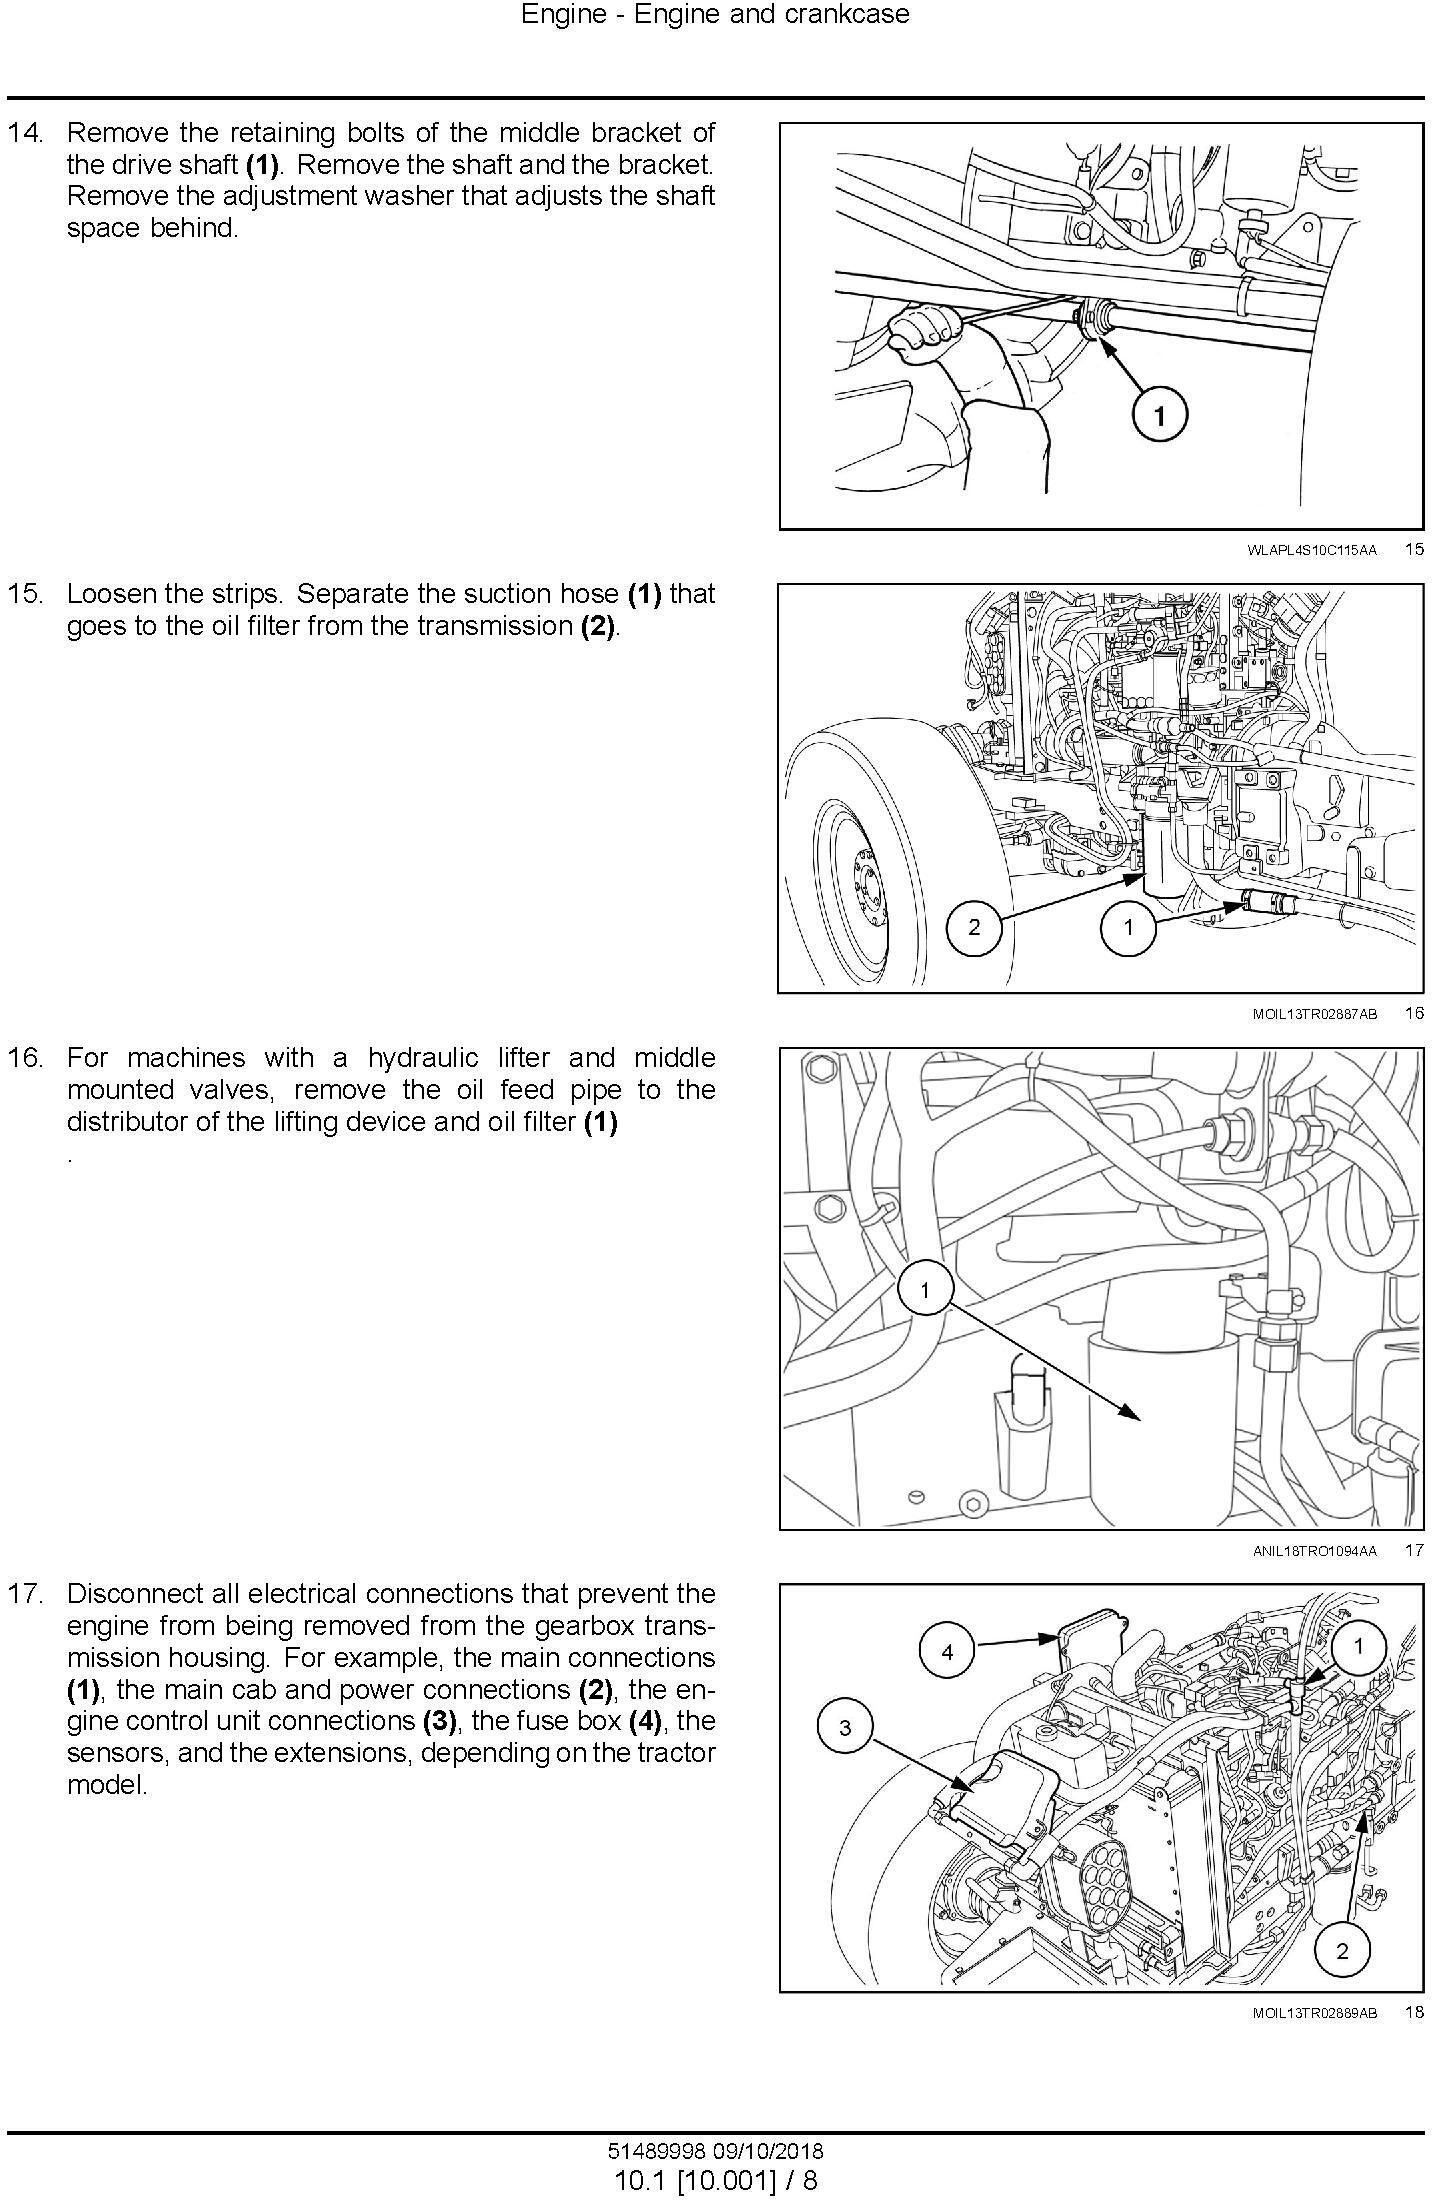 New Holland Workmaster 55, Workmaster 65, Workmaster 75 Tractor Service Manual - 1